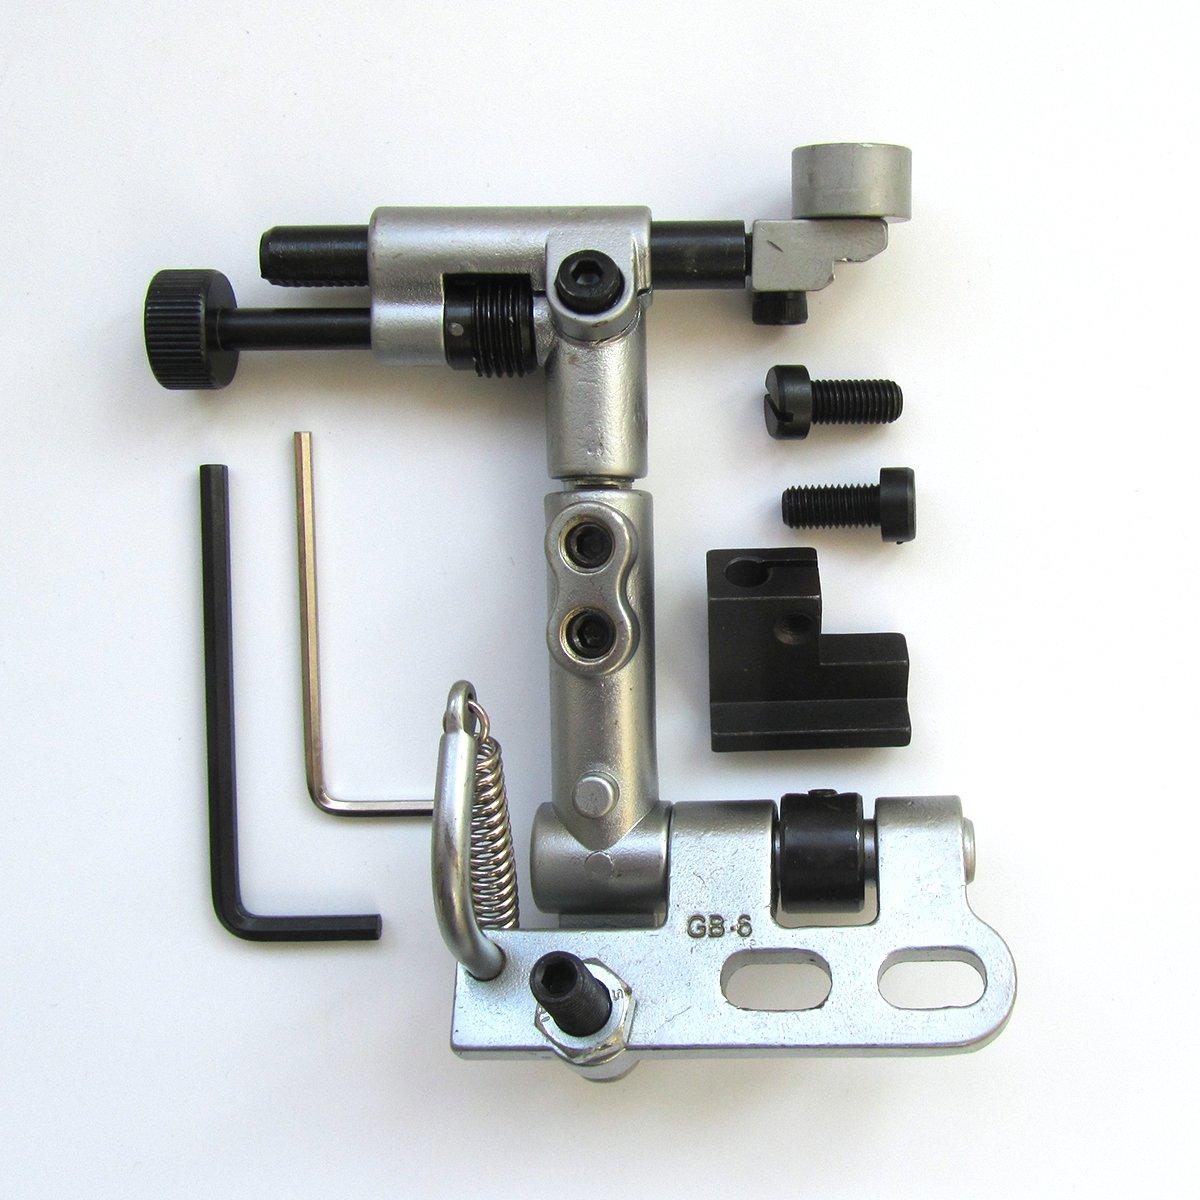 #GB-6 1SET Suspended Edge Guide for Juki LU-1508 LU-1510 Industrial Sewing Machines KUNPENG